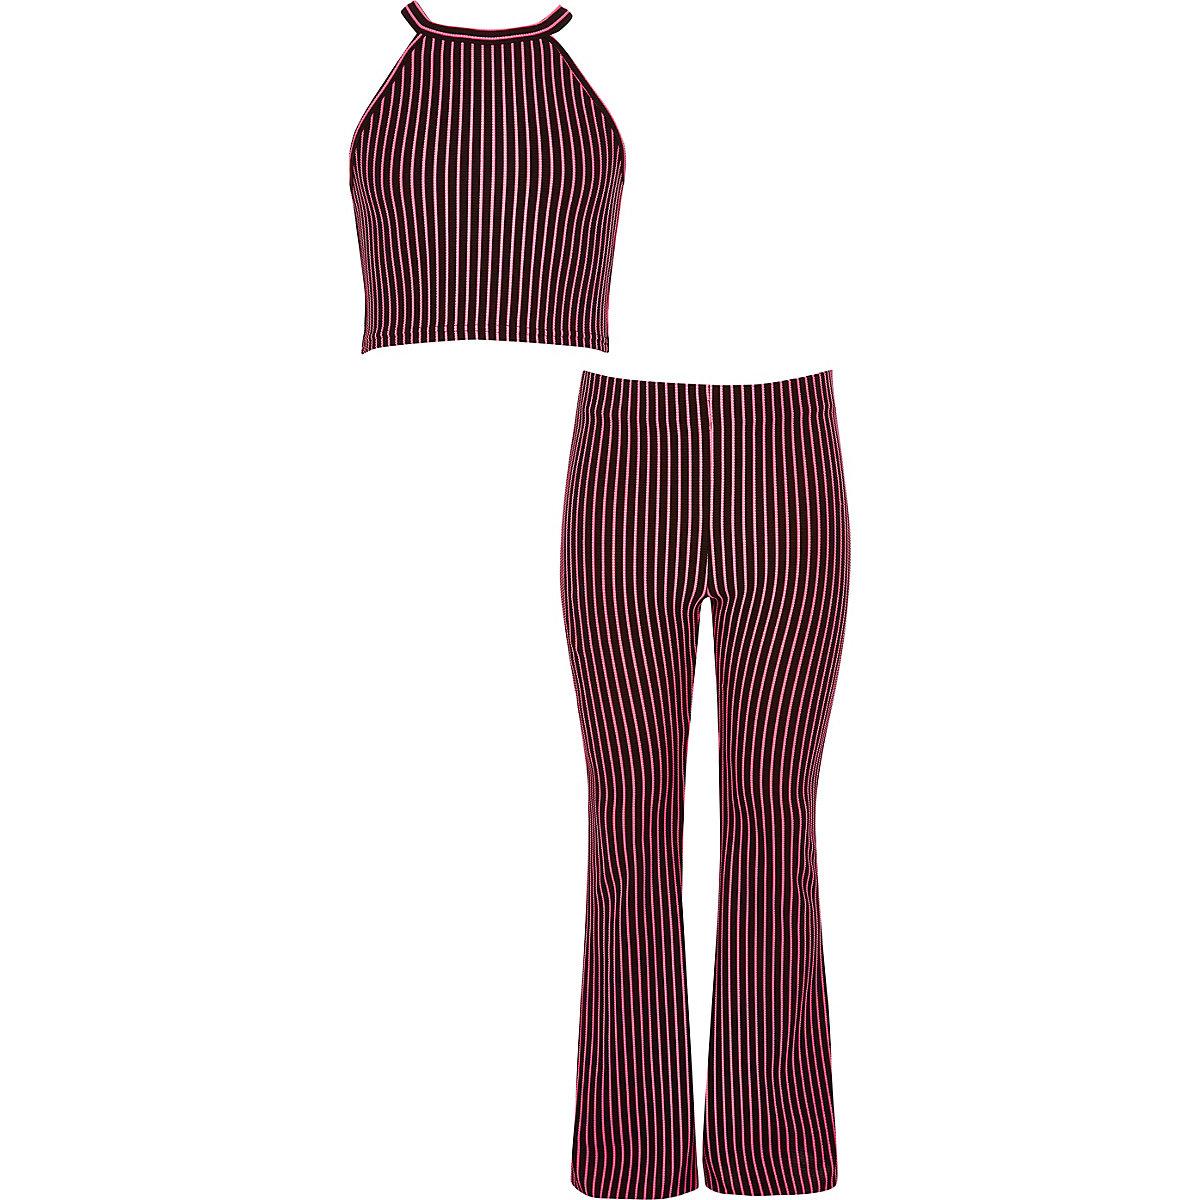 Girls pink stripe print crop top outfit